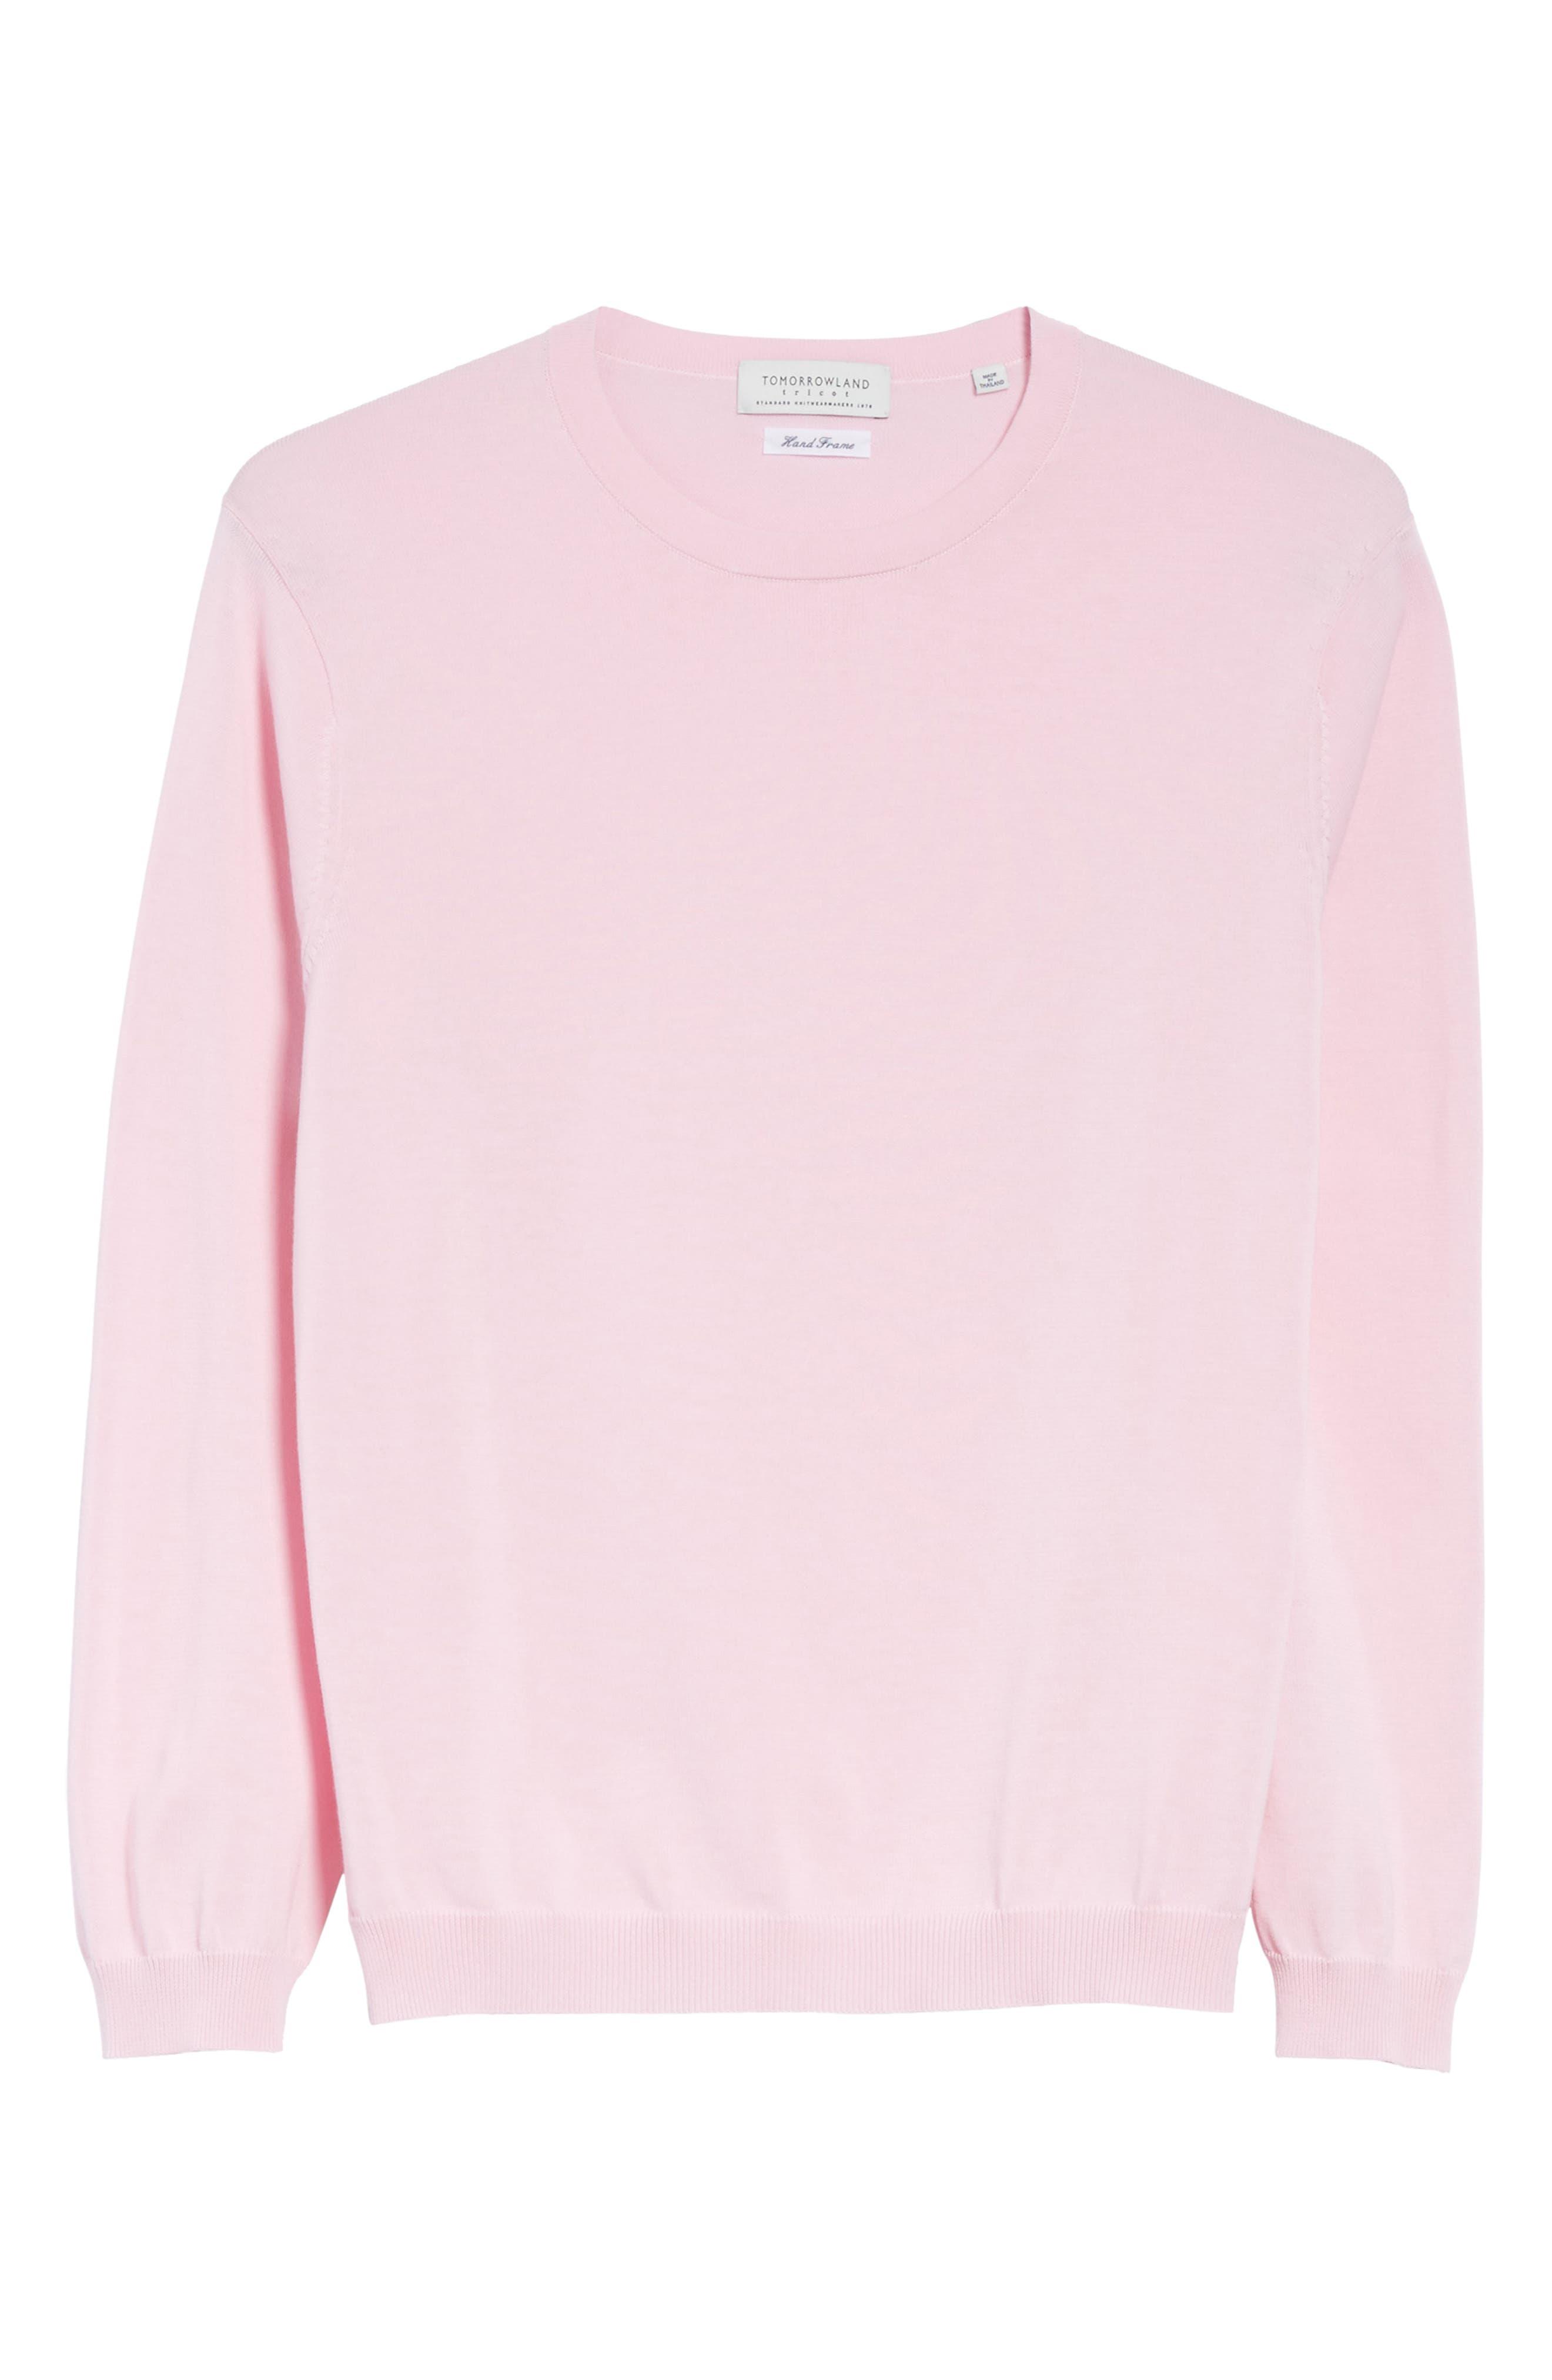 Crewneck Sweater,                             Alternate thumbnail 6, color,                             Pink